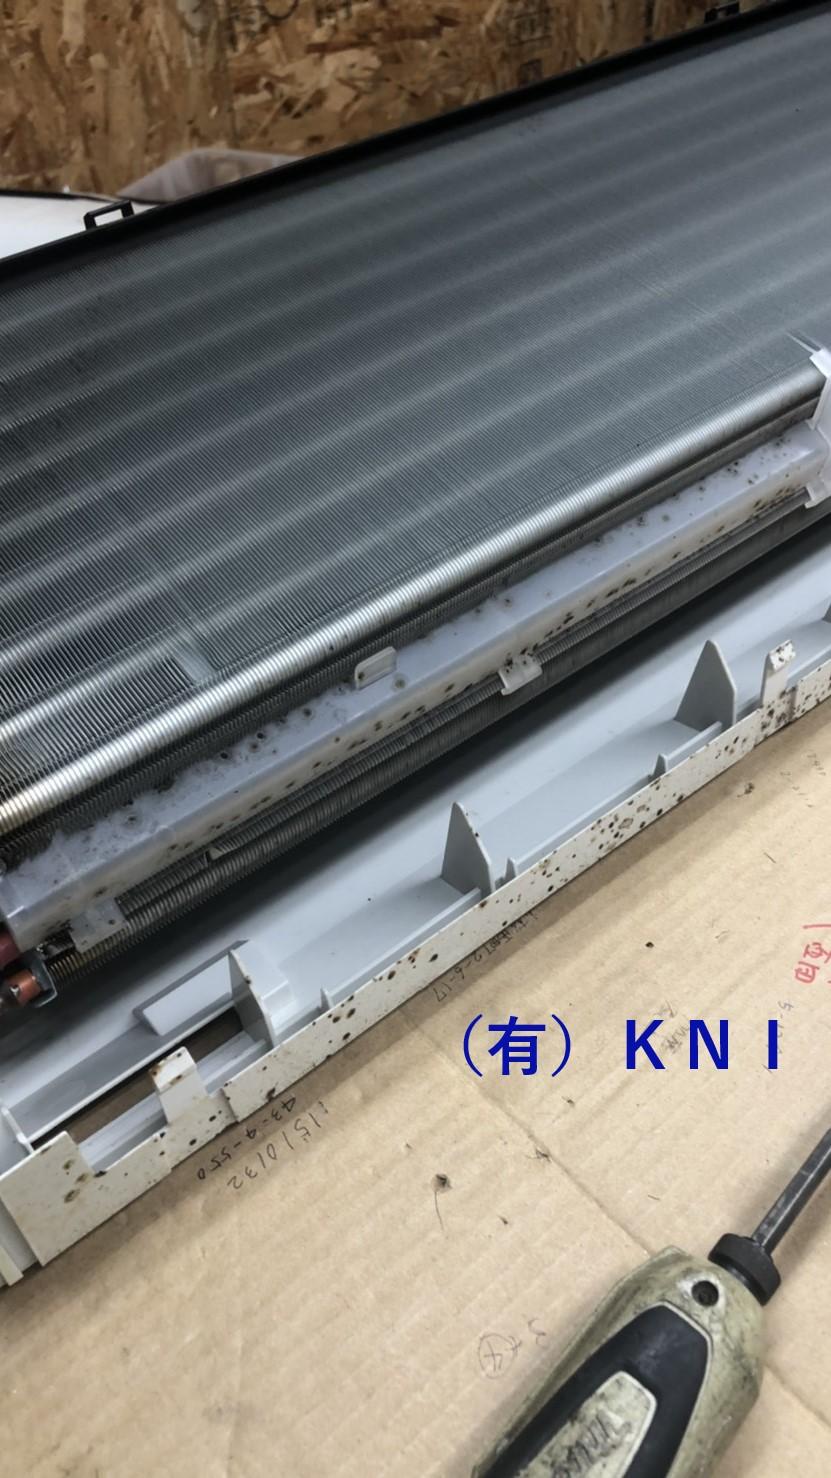 https://eakonya.com/blog/item_images/200322.03.jpg